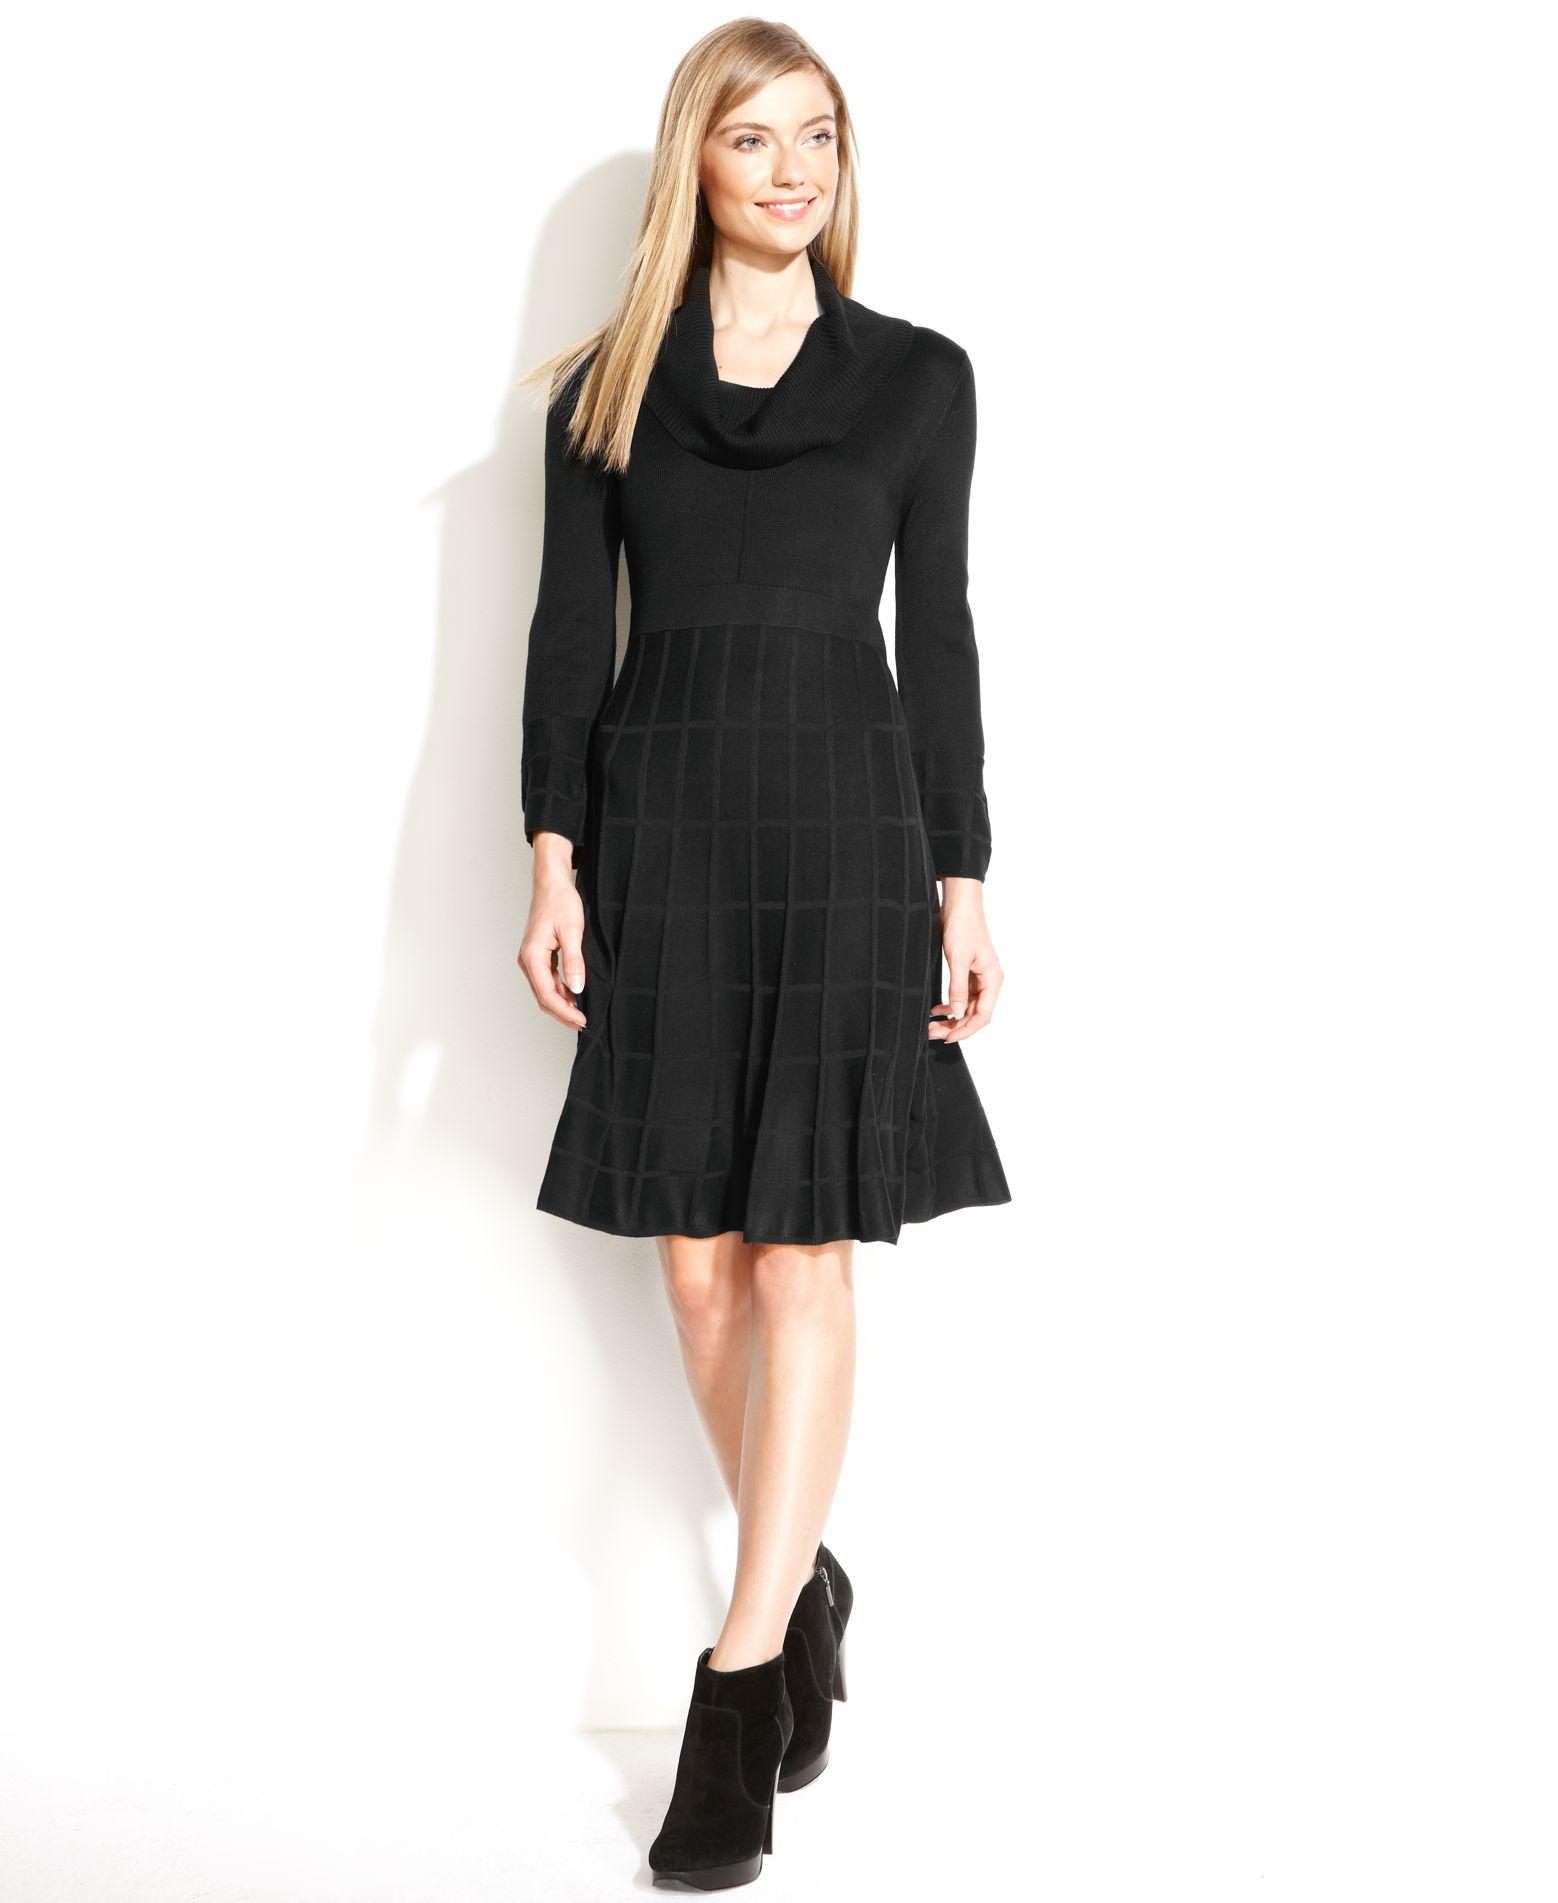 calvin klein black dresses macys photo - 1